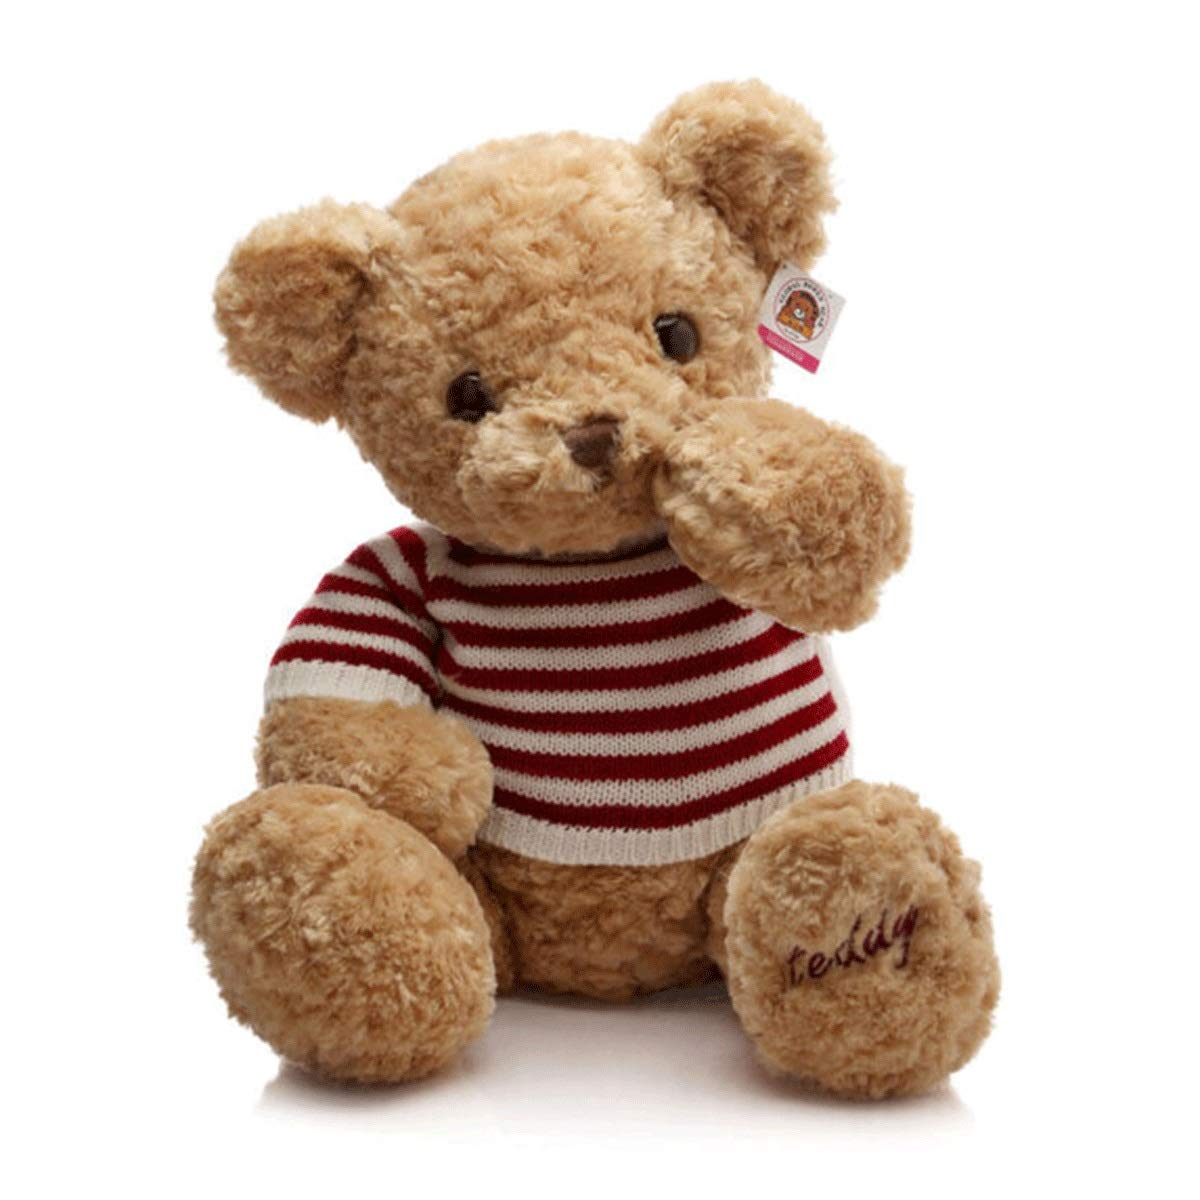 Khaki 80cm Khaki 80cm 8haowenju Plush Toys, Sweater Plush Teddy Bear, Doll Teddy Bear, Birthday Present, Brown Khaki, Various Sizes, Best Gift Latest Models (color   Khaki, Size   80cm)